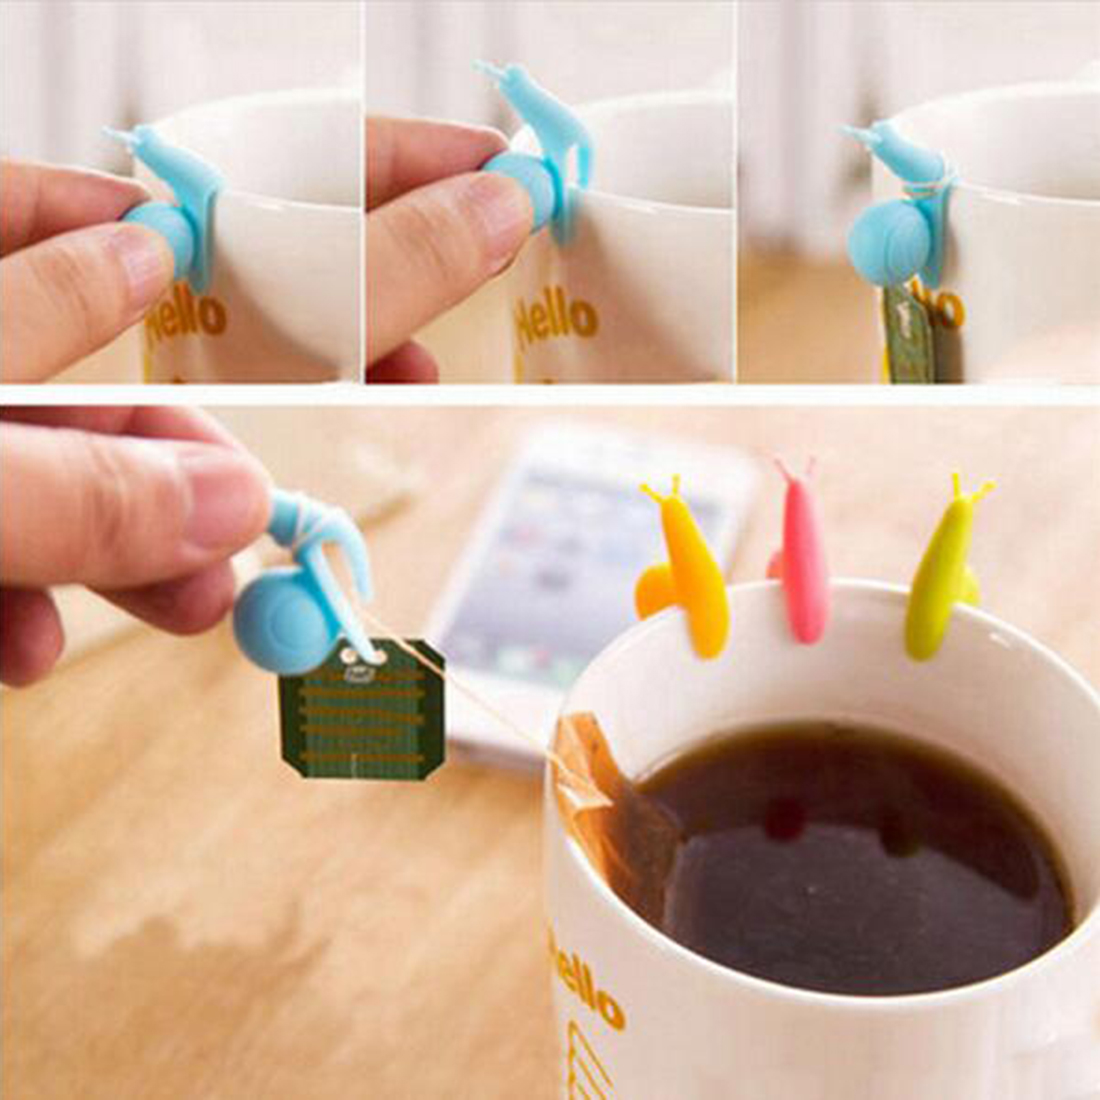 5Pcs Tea Bag Holder Cute Snail Shaped Silicone Cup Mug Hanging Tool Gift Set Random Color coffee cup holder(China (Mainland))